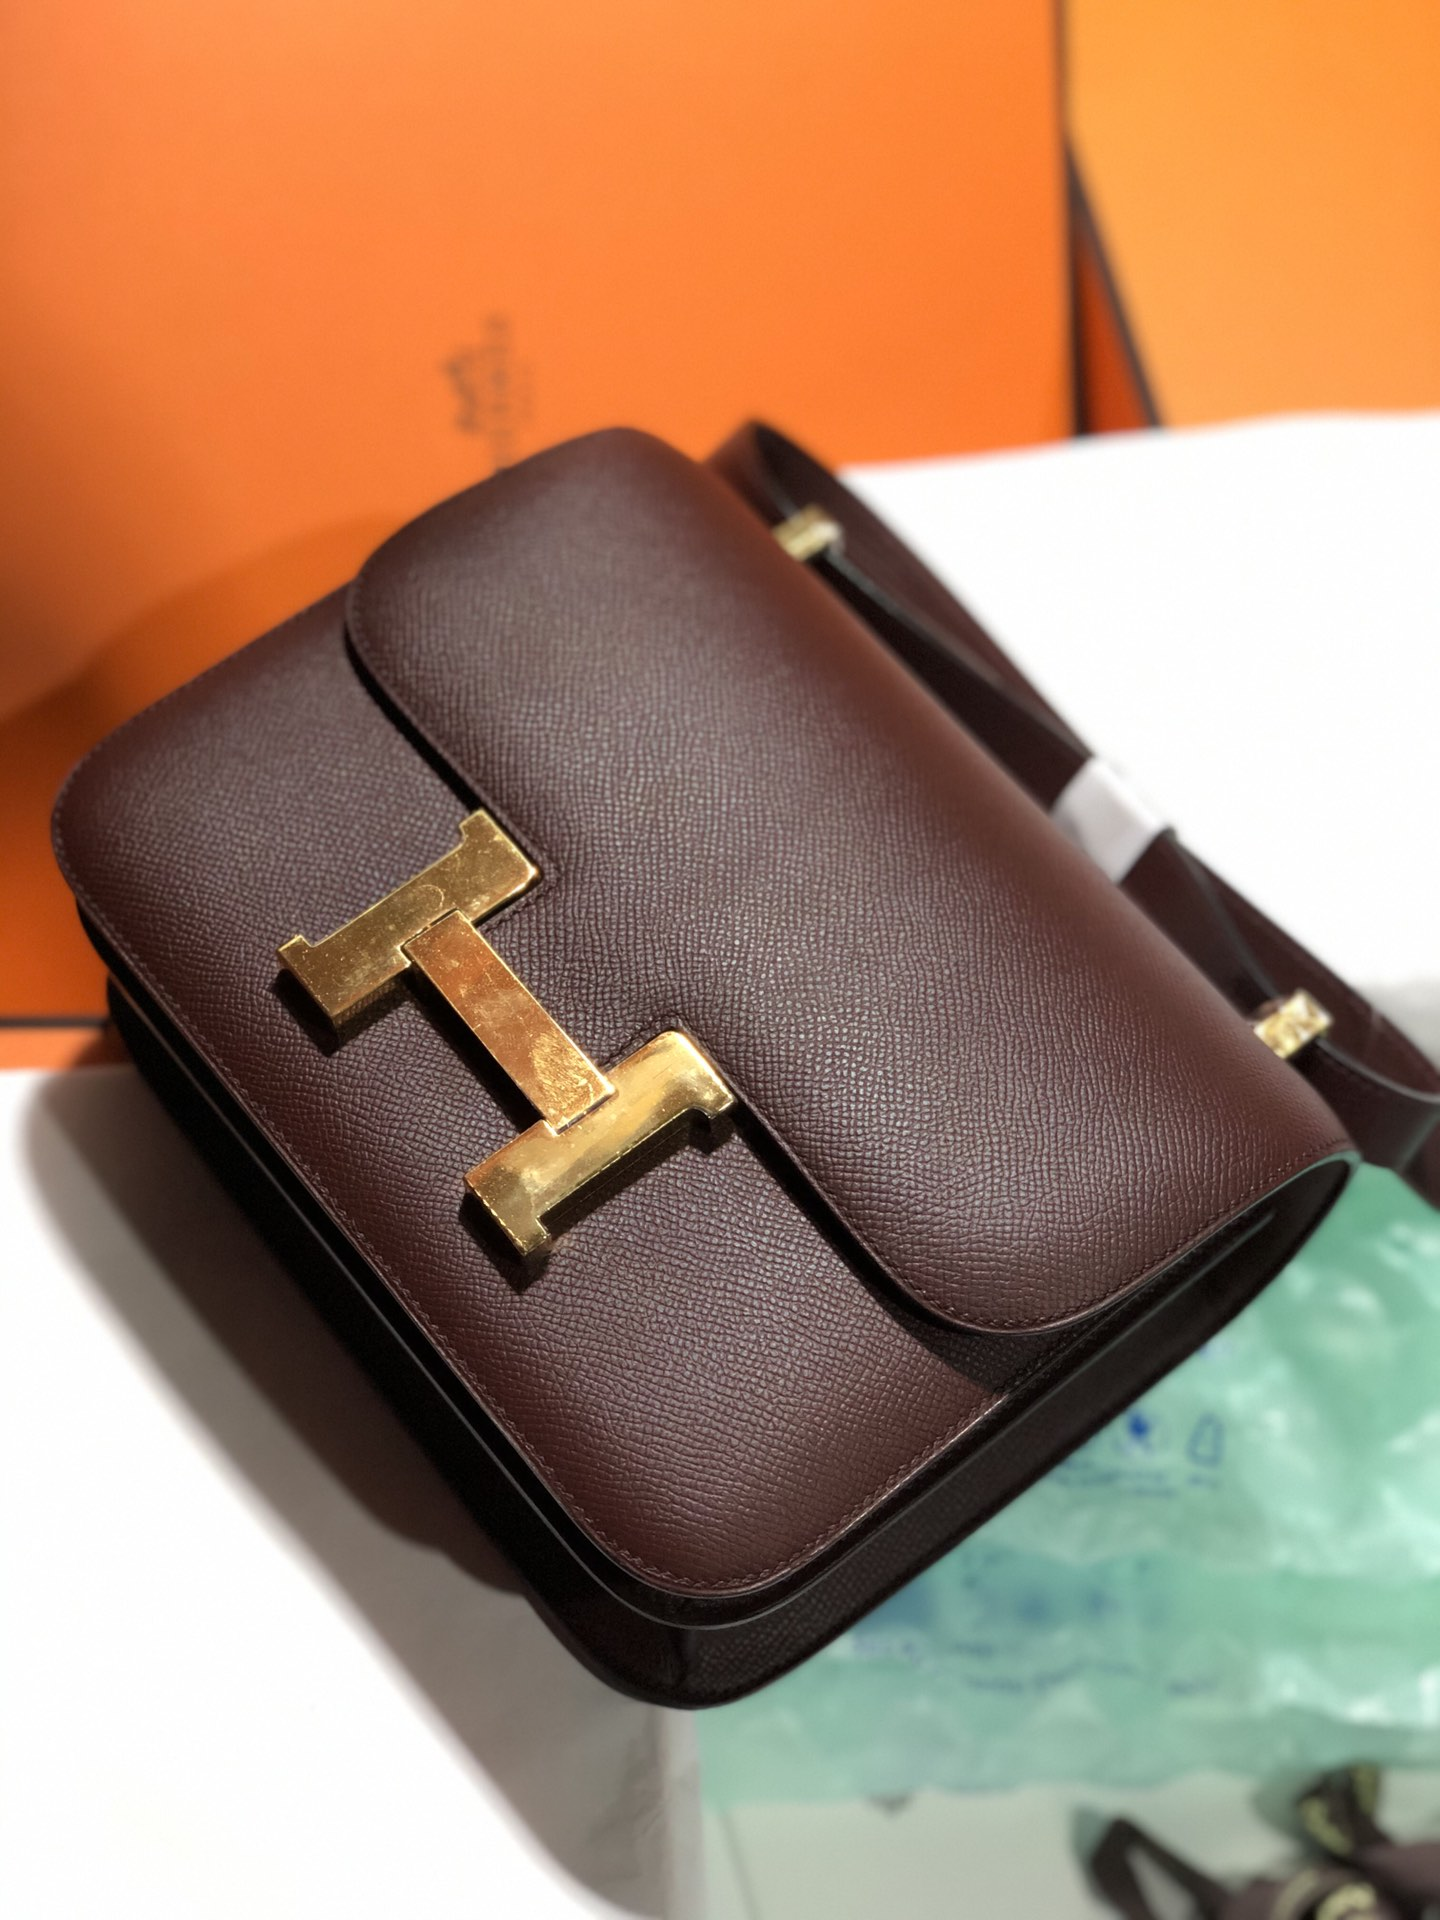 Pretty Hermes Epsom Calf Constance24cm Bag CK57 Bordeaux Gold Hardware